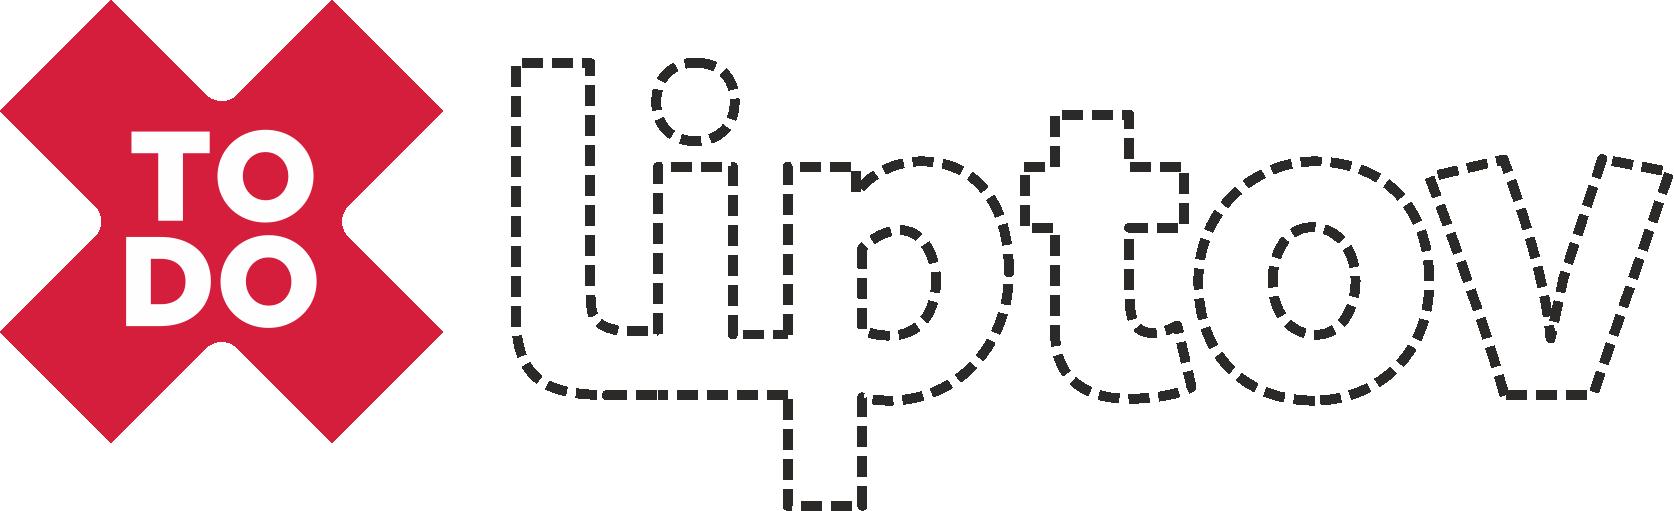 TO DO Liptov logo